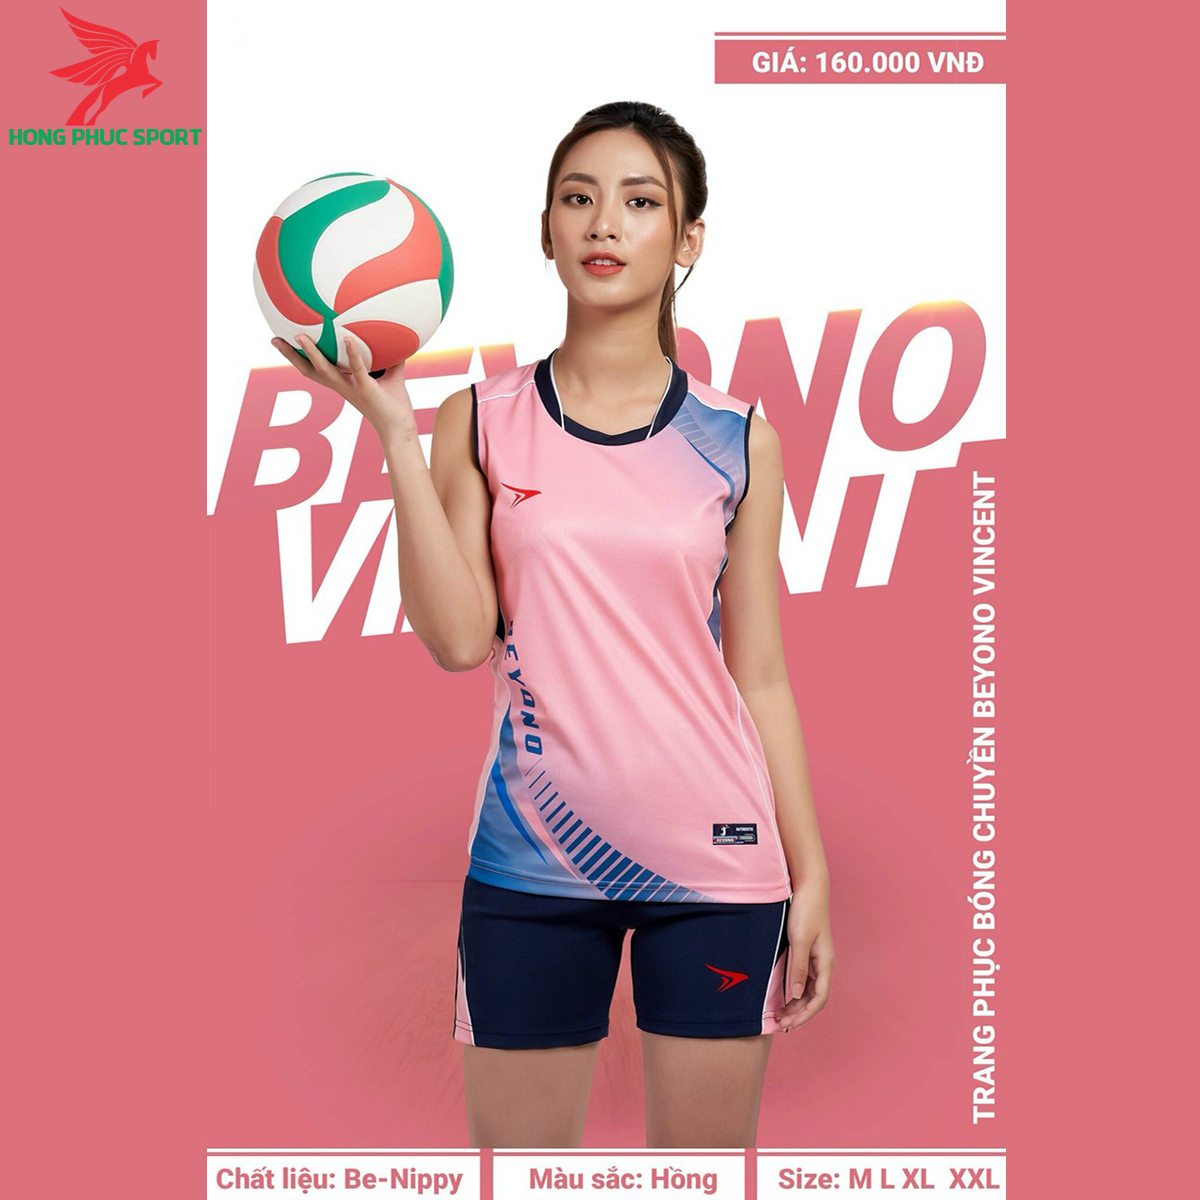 https://cdn.hongphucsport.com/unsafe/s4.shopbay.vn/files/285/ao-bong-chuyen-beyono-vincent-mau-hong-3-6039bfcdc12c5.png